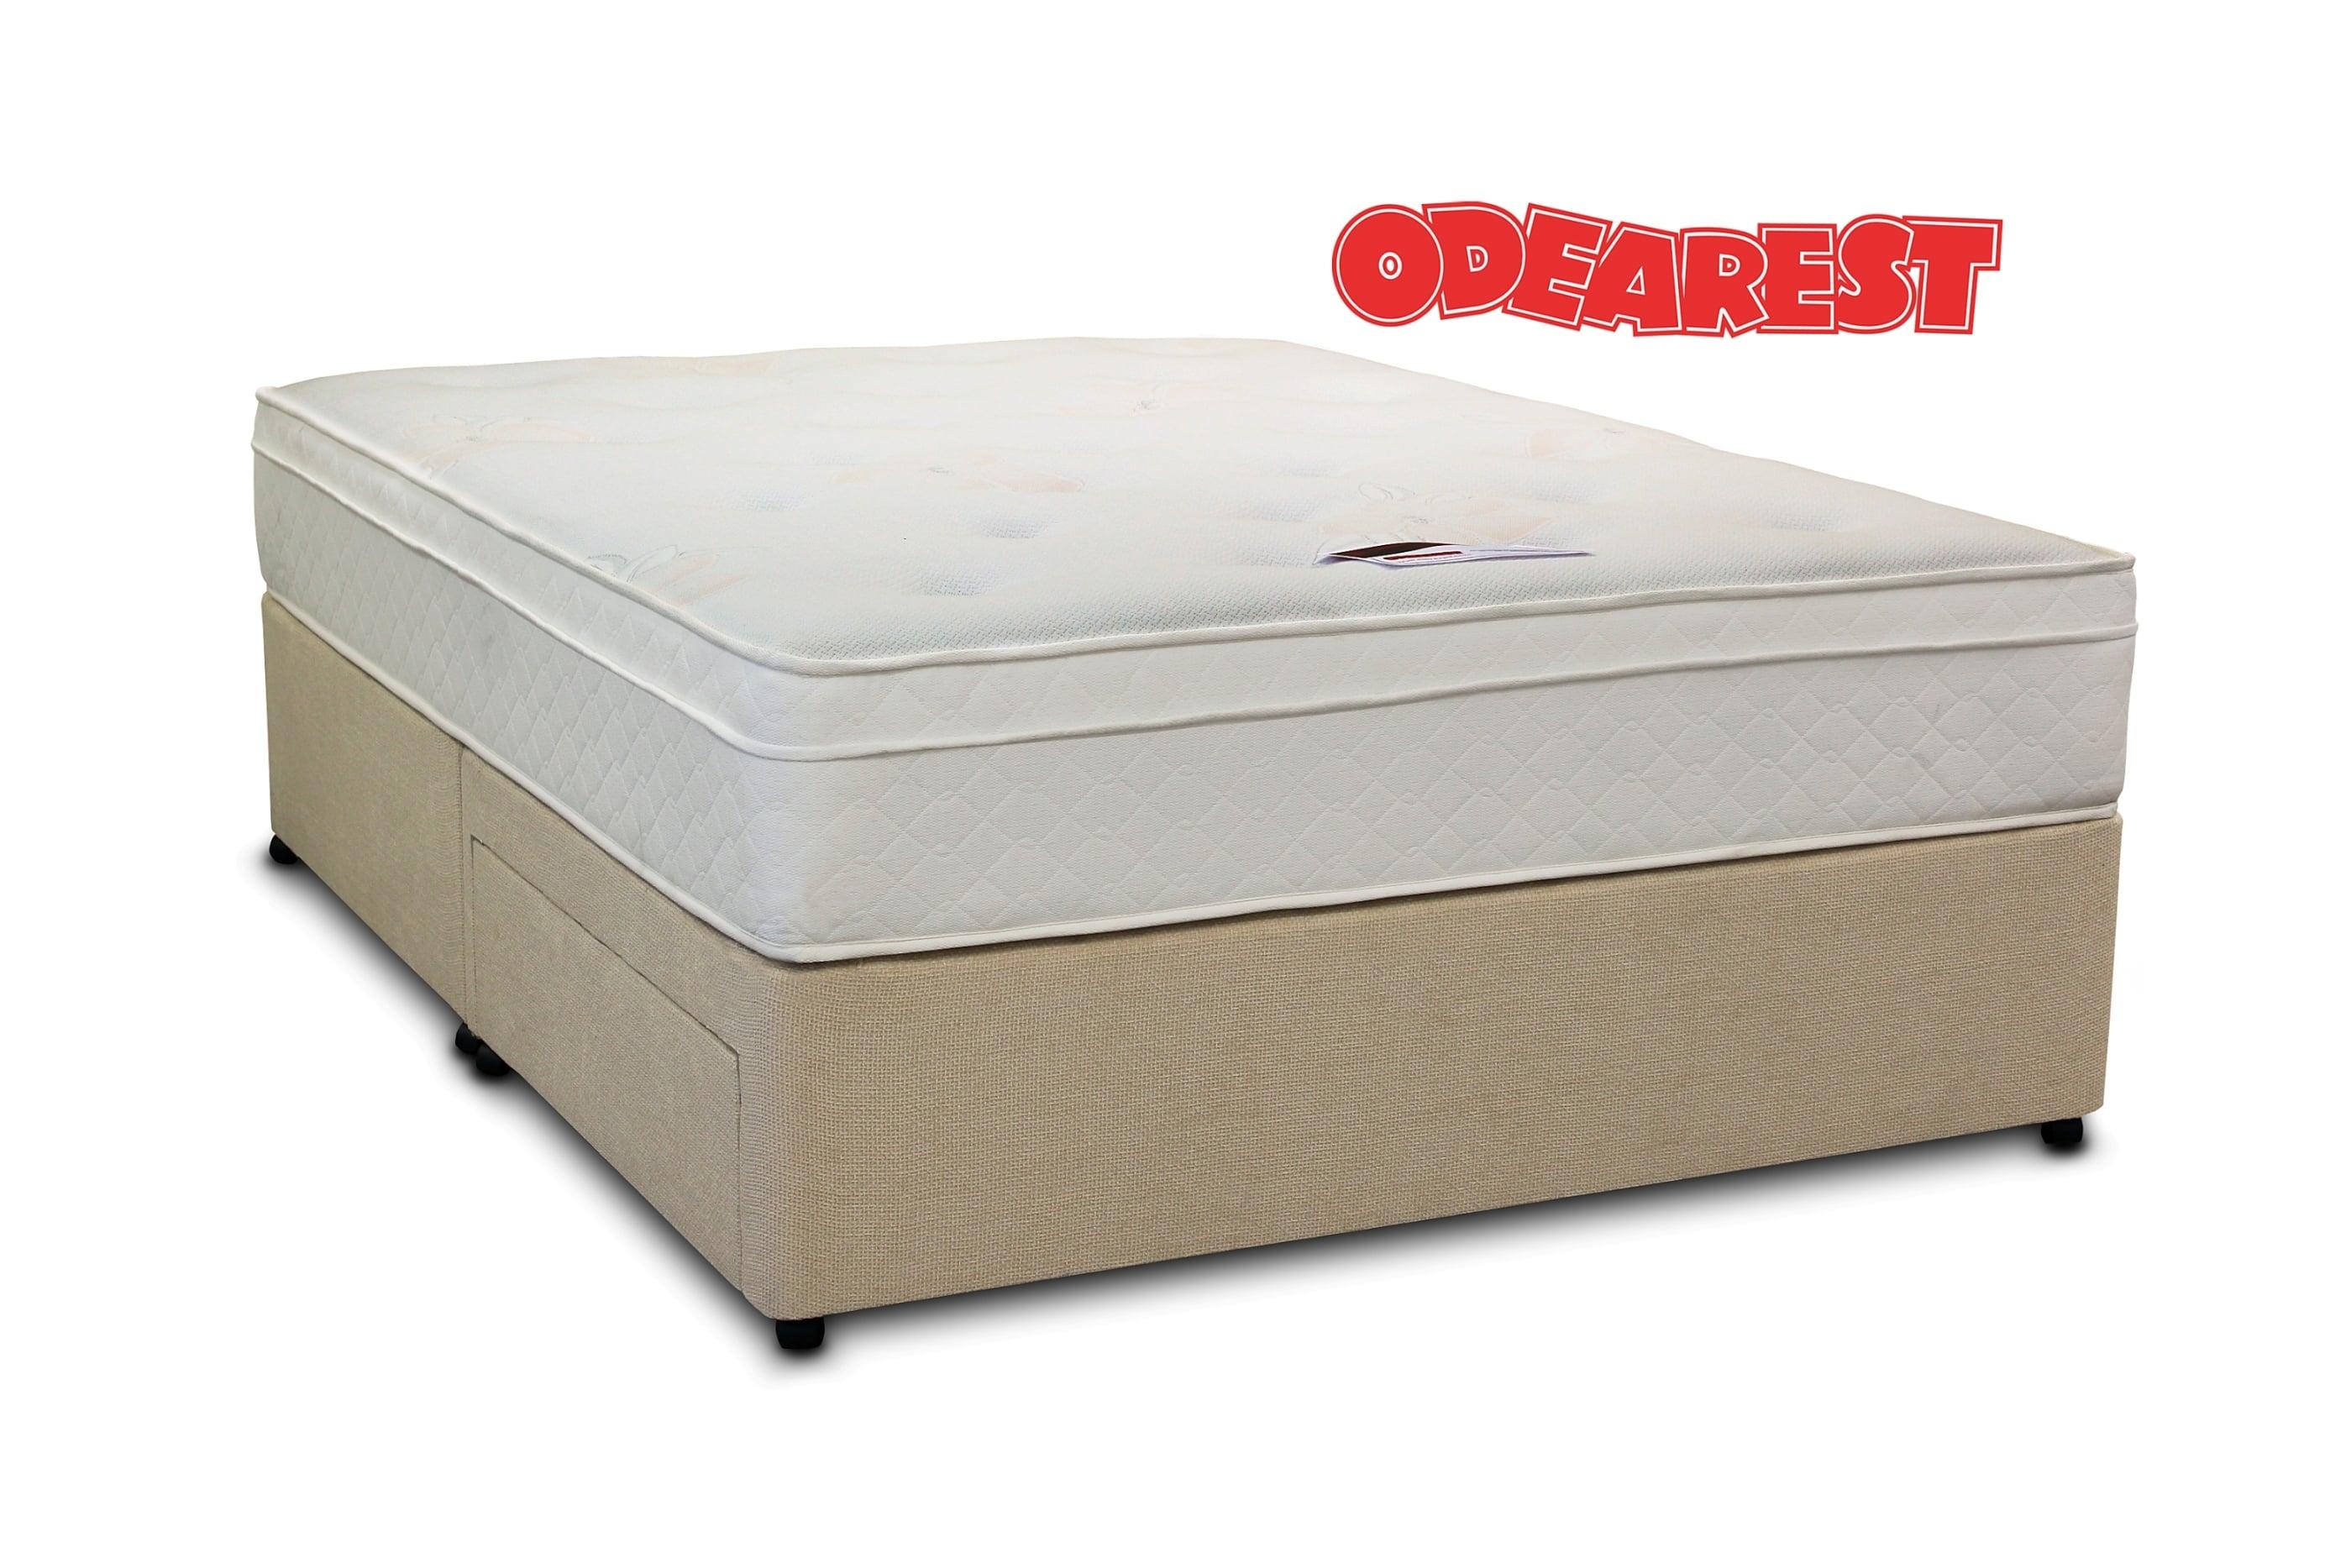 Odearest 5' Orchid Pocket Divan Bed